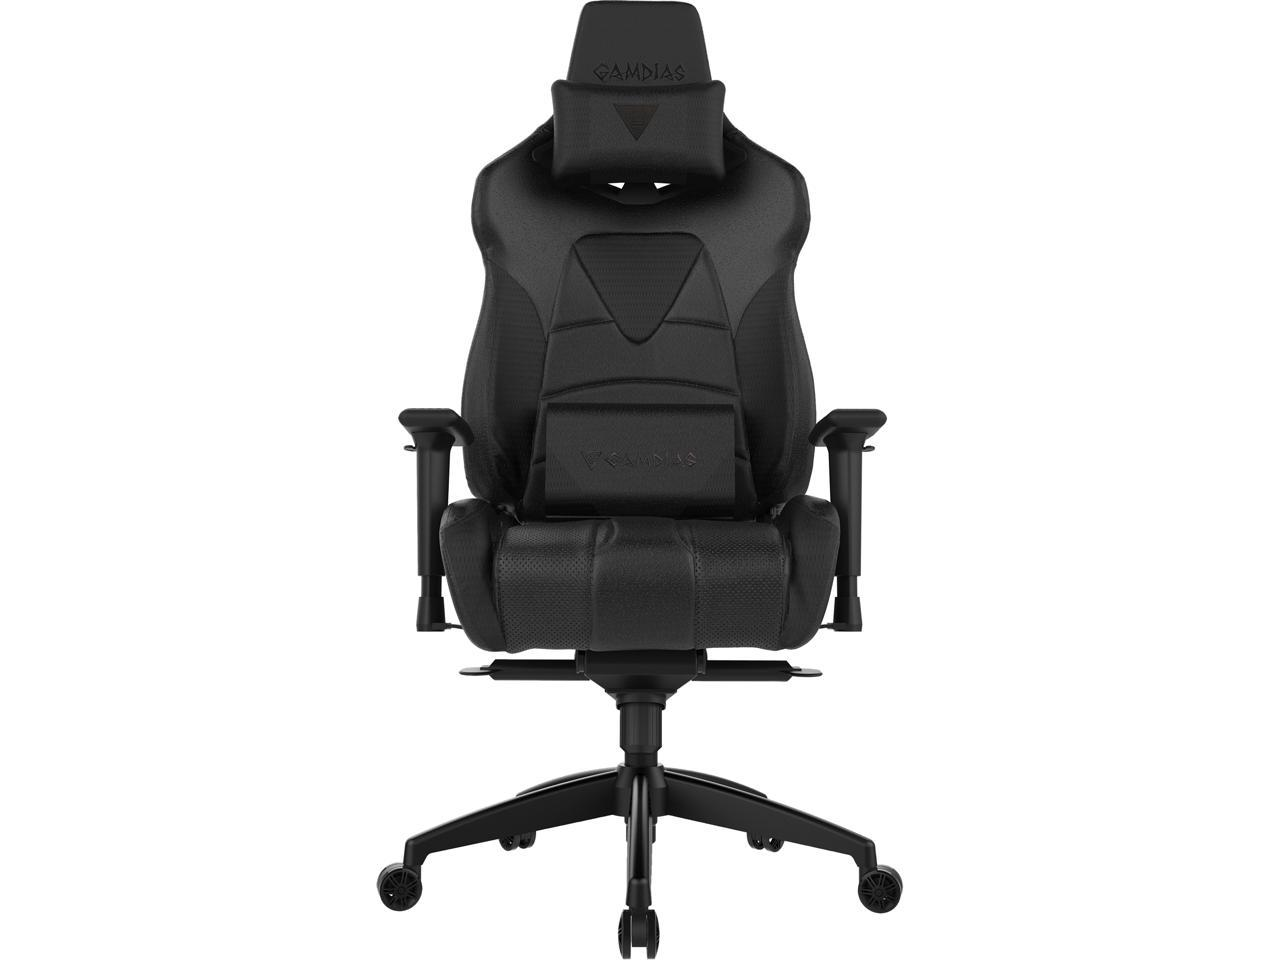 Remarkable Gamdias Achilles M1 Rgb Gaming Chair Black Makagou Com Alphanode Cool Chair Designs And Ideas Alphanodeonline